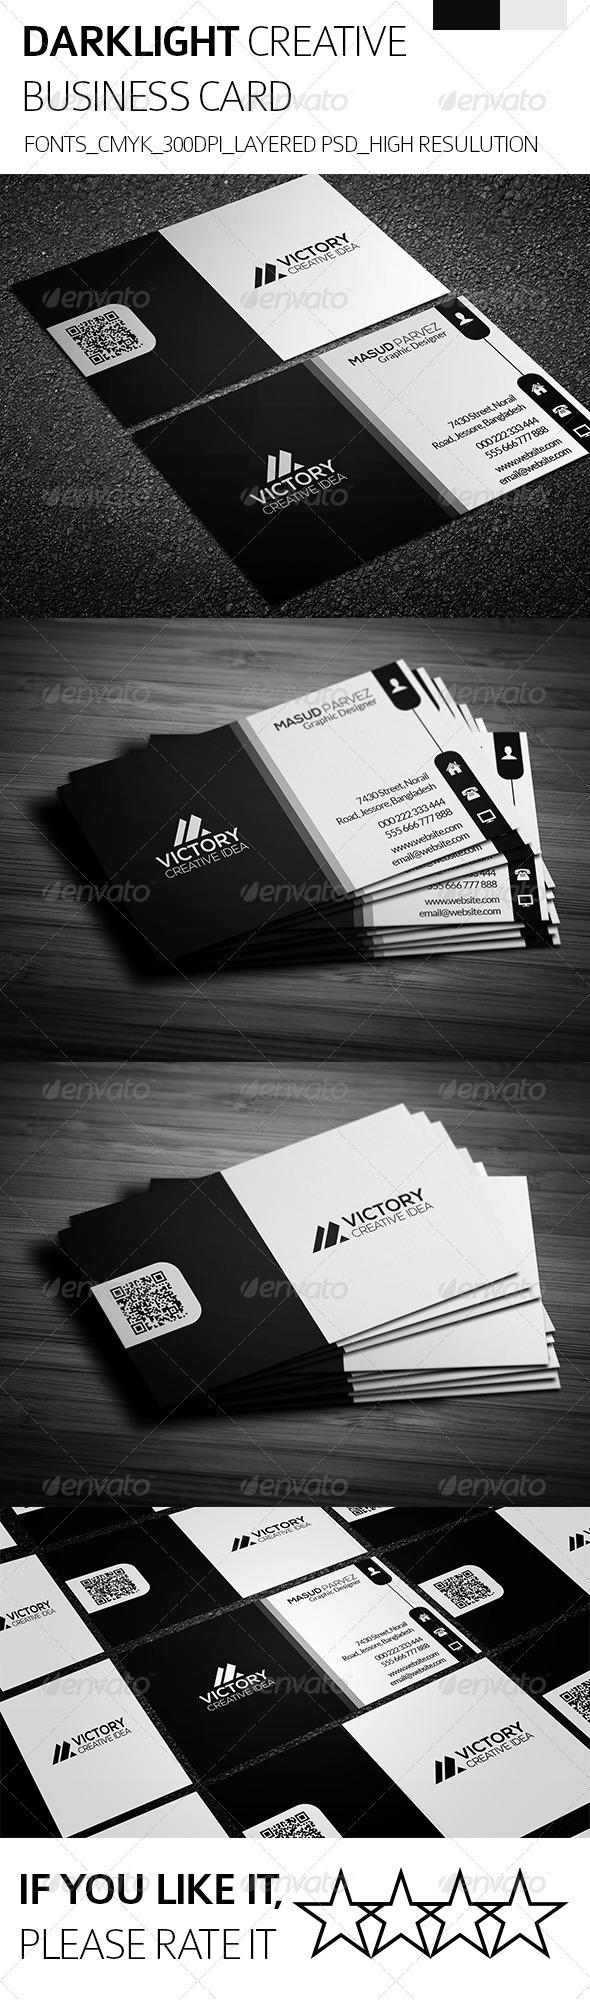 Dark Light & Creative Business Card